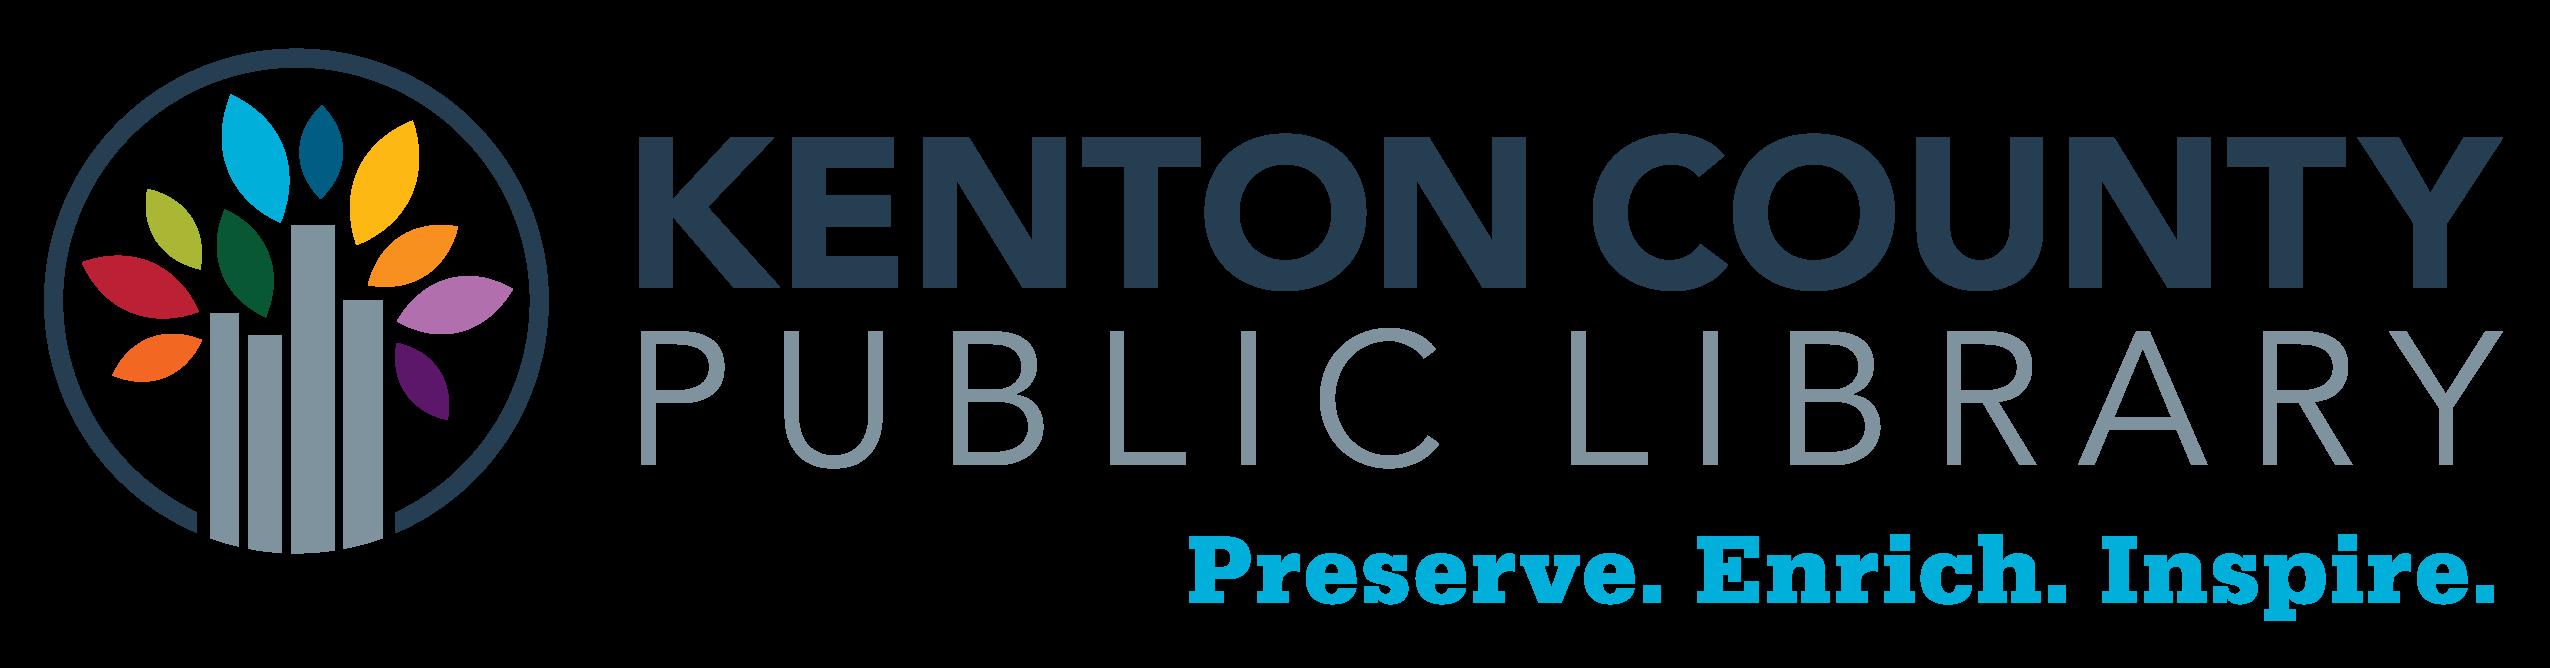 Library clipart public library. Kenton county preserve enrich